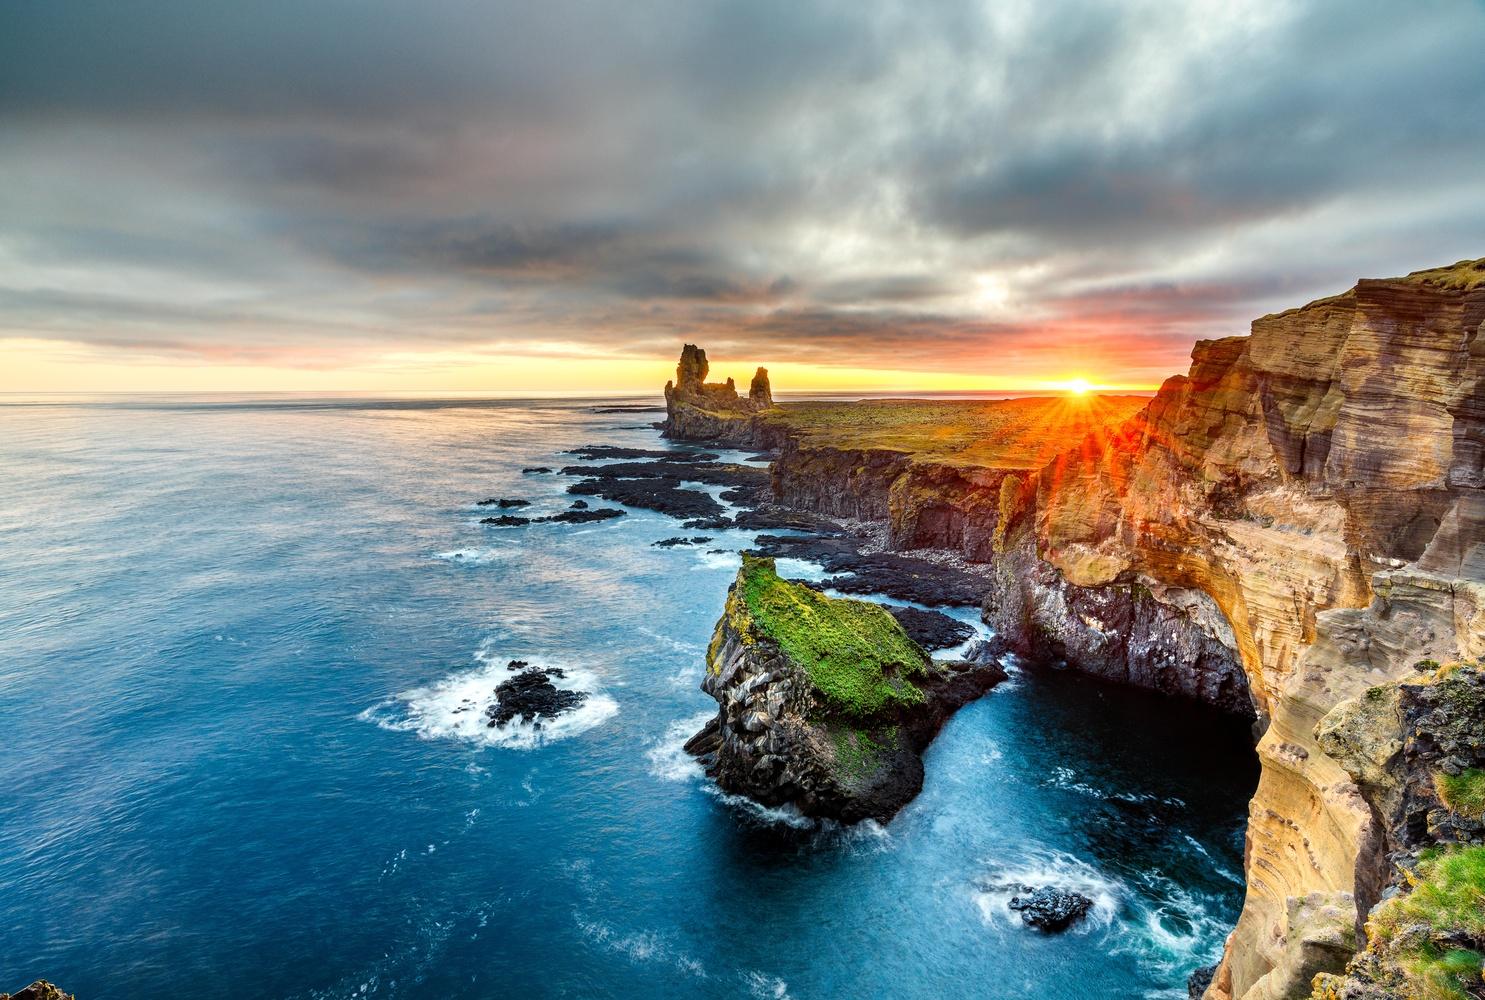 Londrangar Cliffs by Spencer Clark